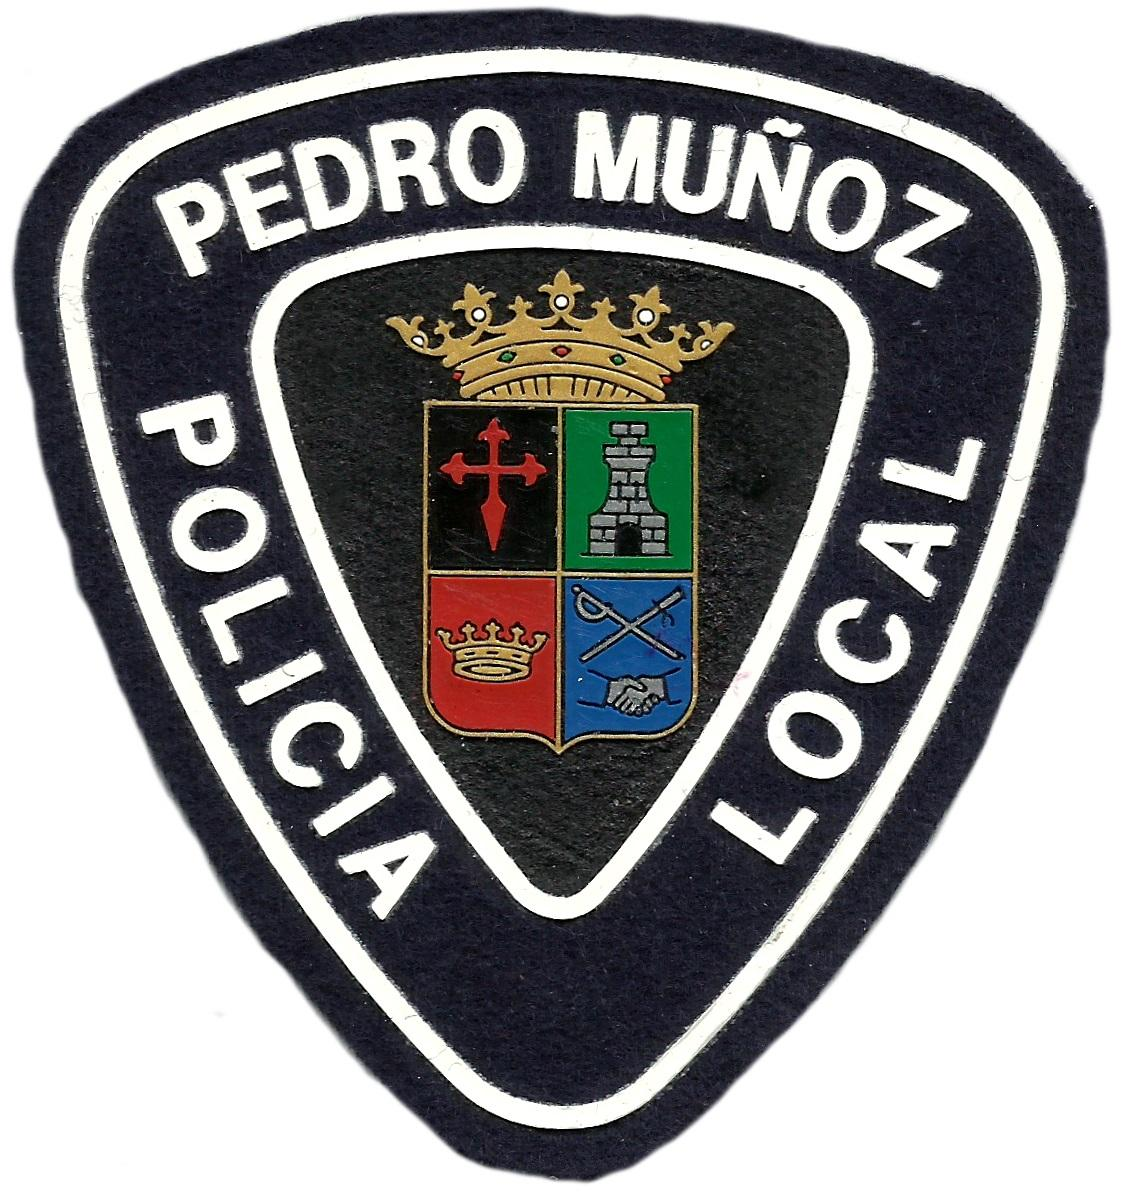 POLICÍA LOCAL PEDRO MUÑOZ PARCHE INSIGNIA EMBLEMA DISTINTIVO